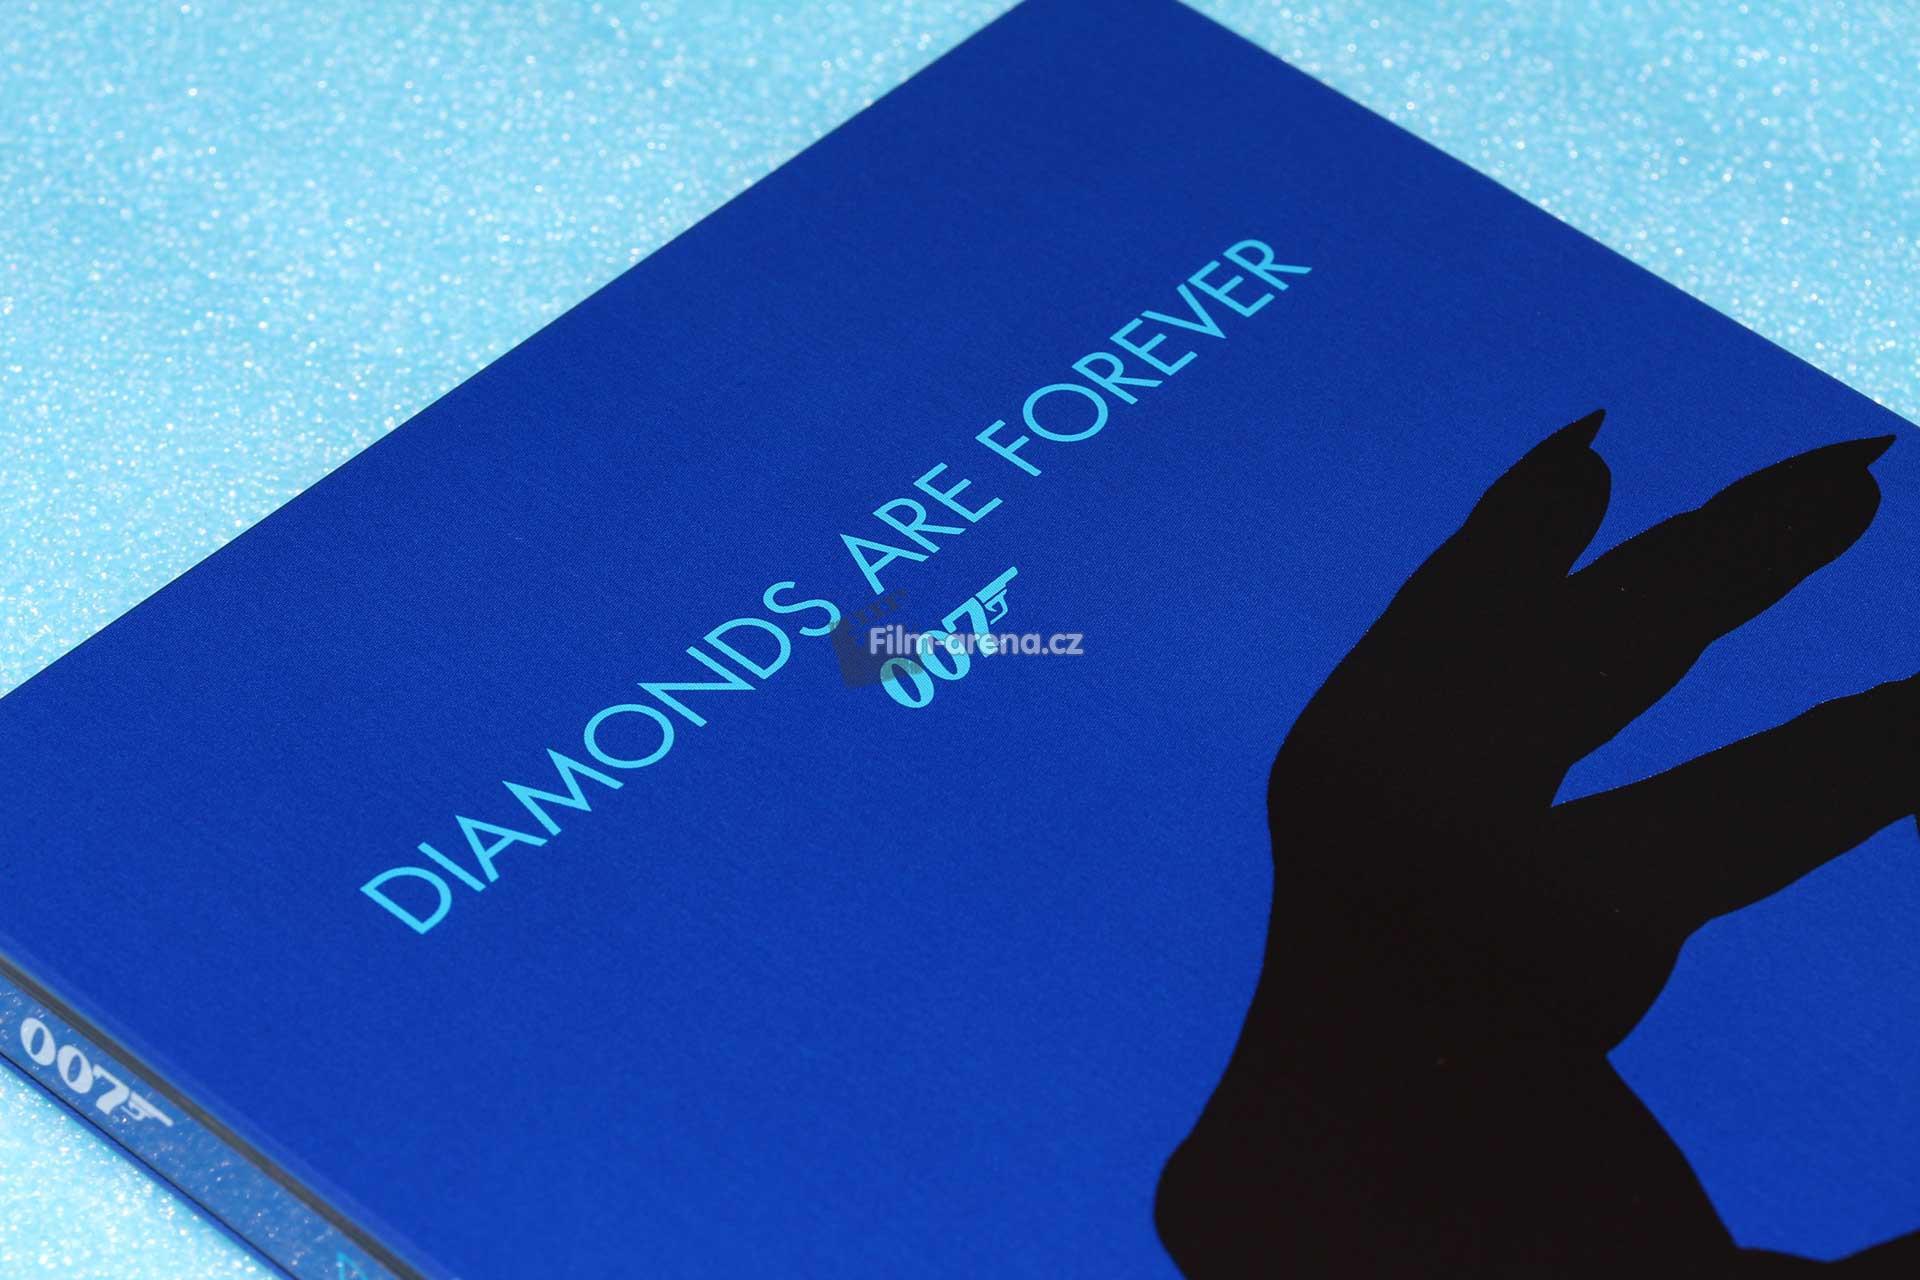 http://www.filmarena.cz/upload/images/nazivo/James_Bond/1971_Diamanty_jsou_vecne/1971_diamanty_09.jpg